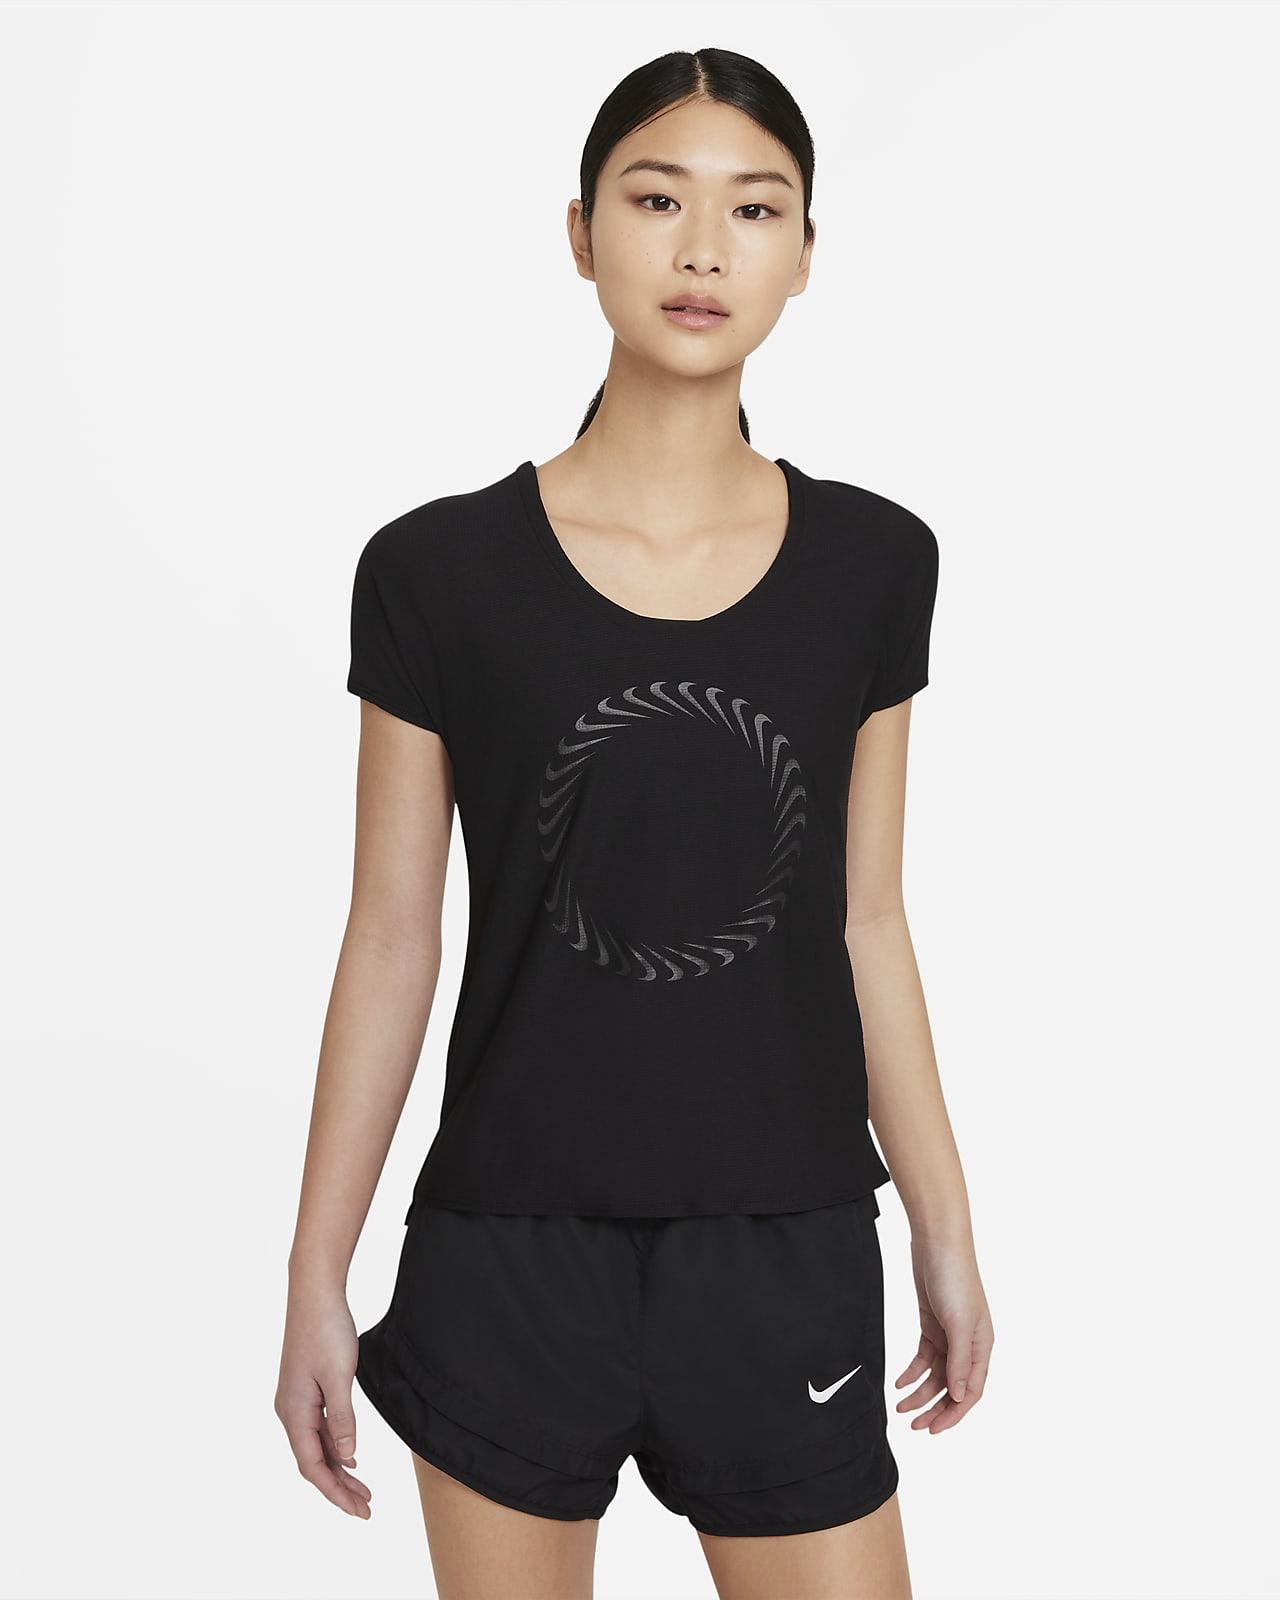 Nike Icon Clash Miler Women's Short-Sleeve Running Top